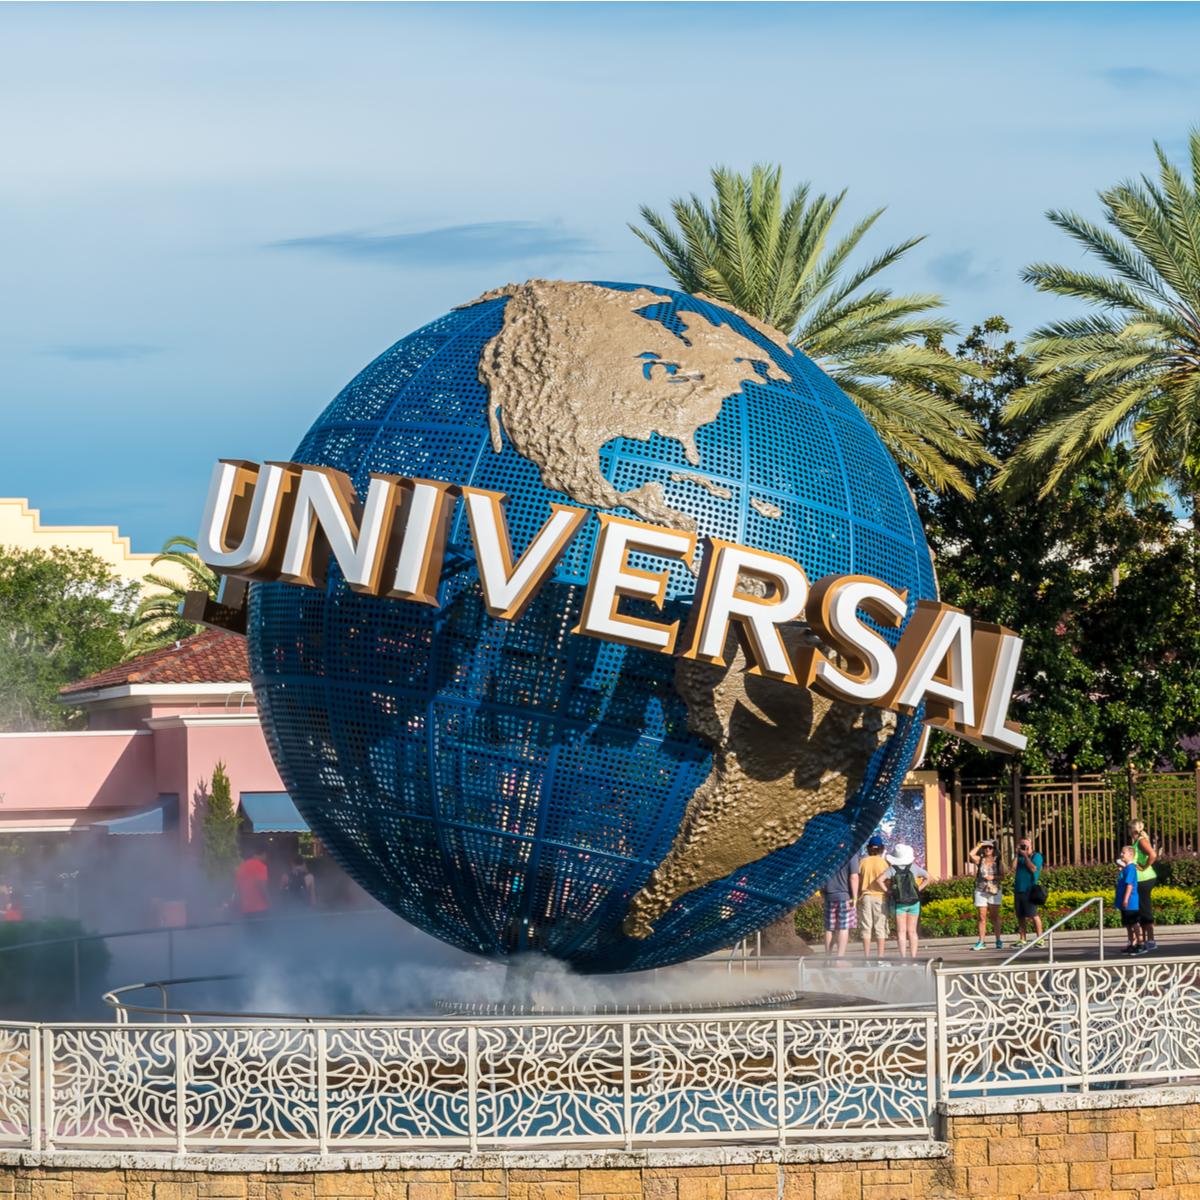 Universal Studios Orlando globe.